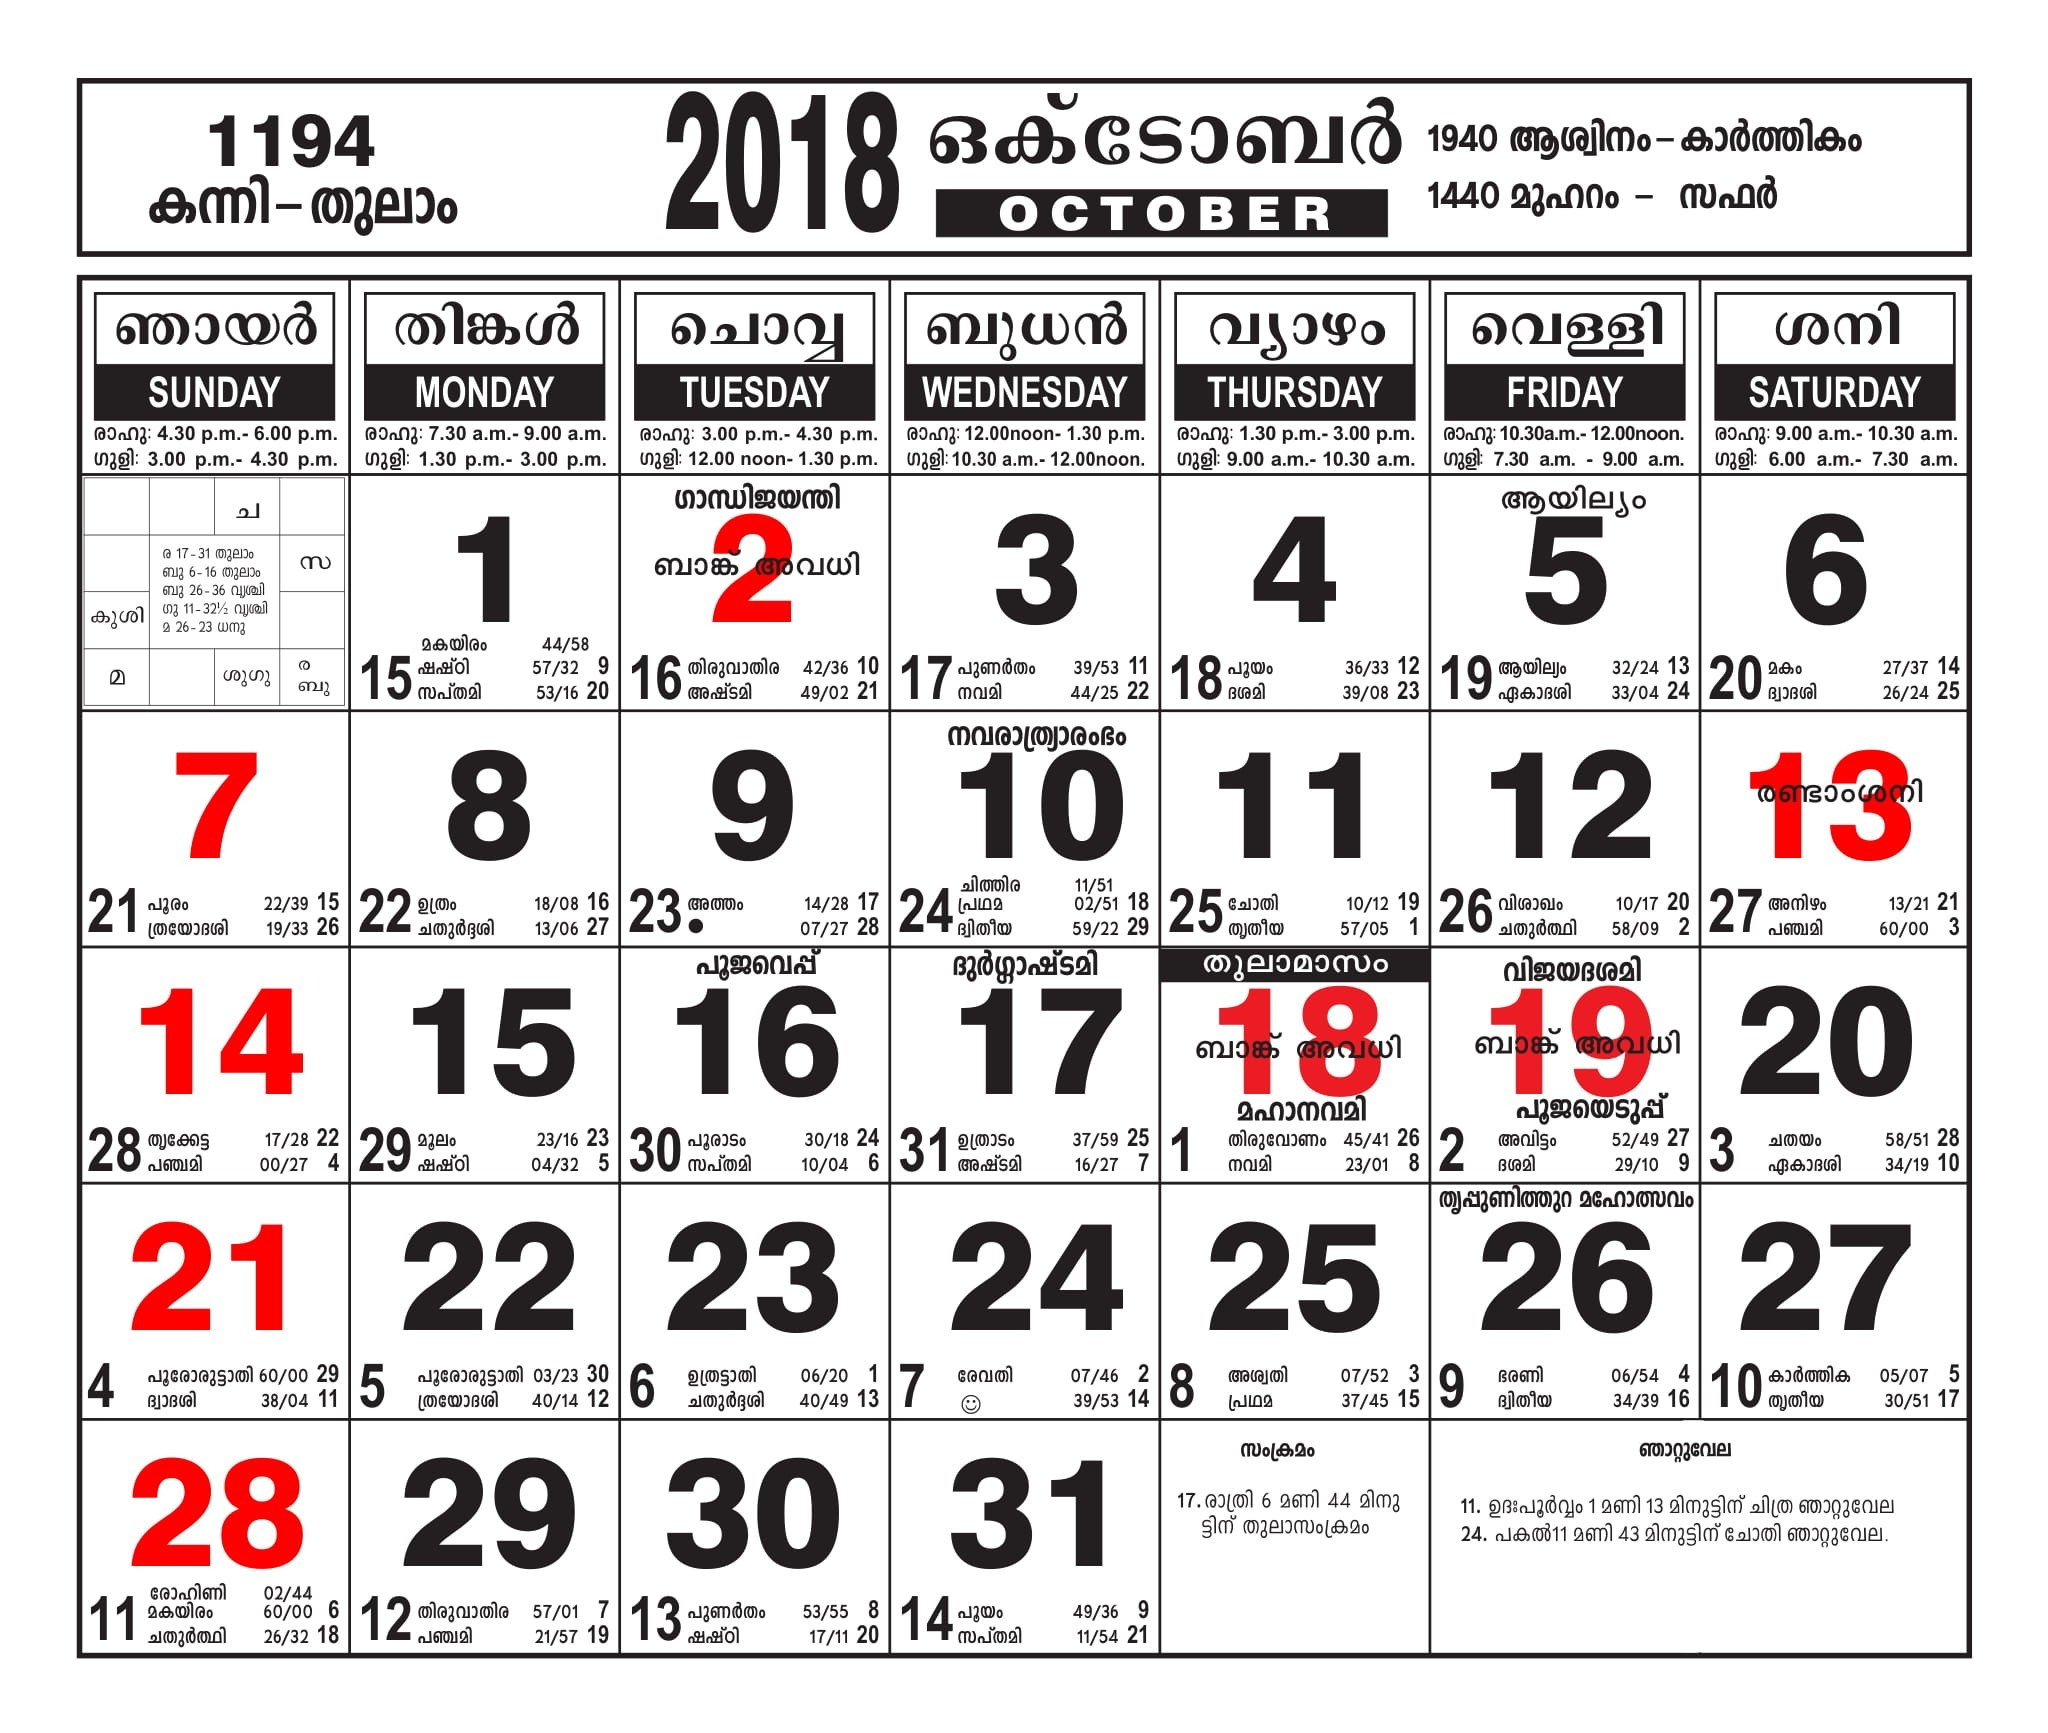 Kerala Govt Calendar 2020 Pdf - Template Calendar Design  2021 Malayalam Calendar Pdf